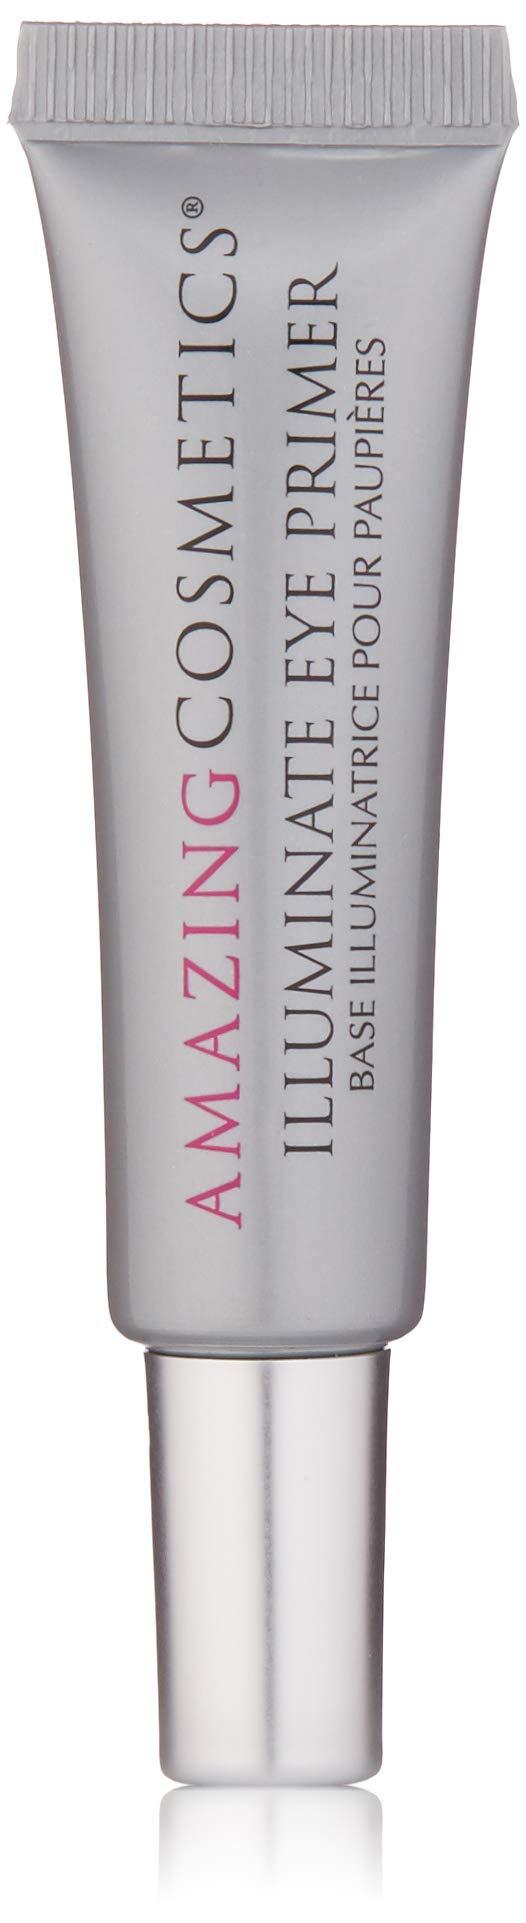 AmazingCosmetics Illuminate Eye Primer, Moonlight Lavender, 0.25 fl. oz.